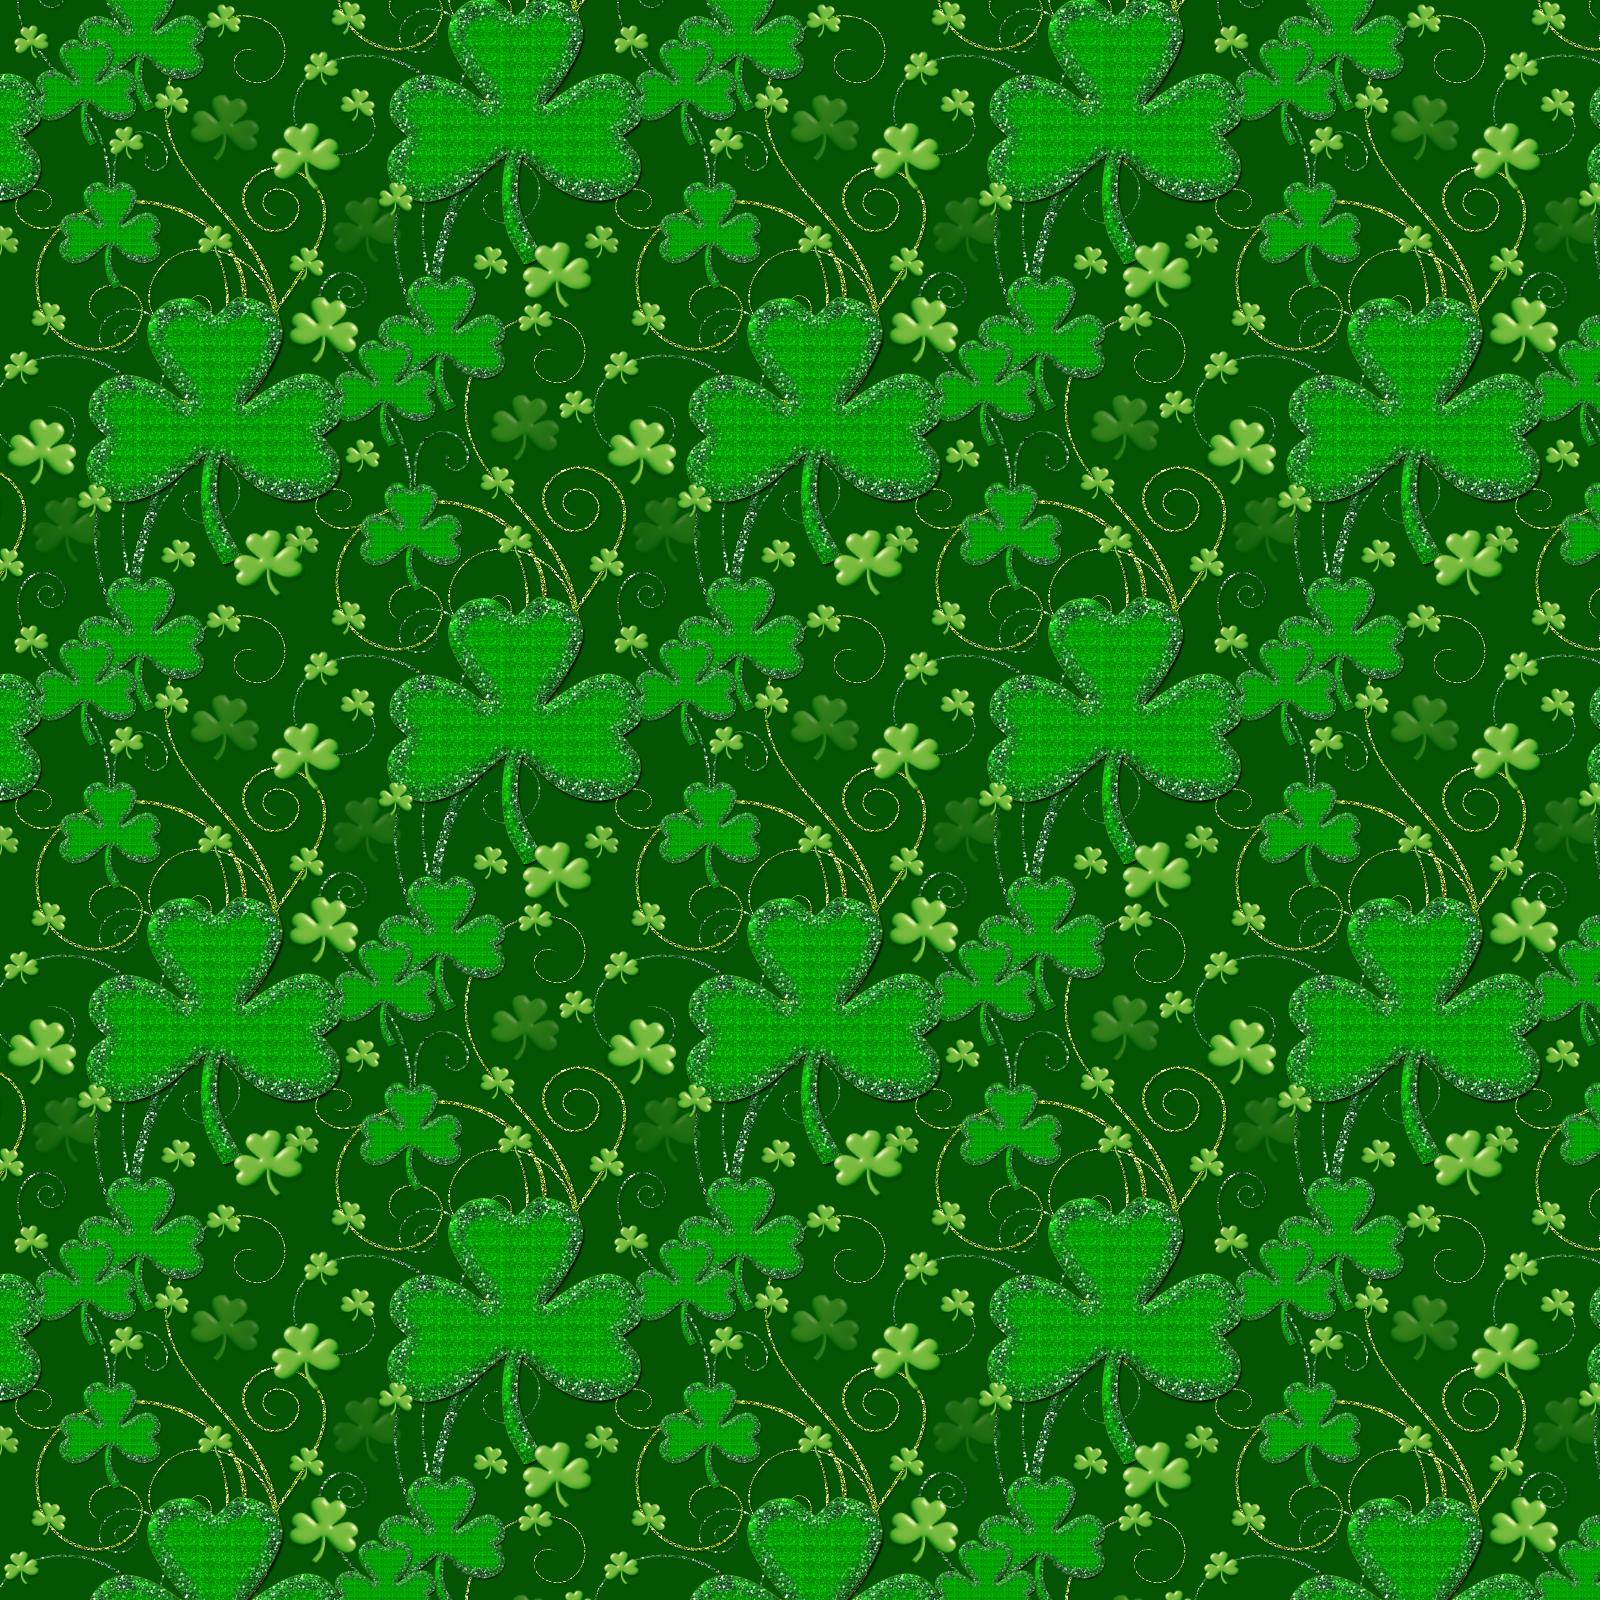 St Patrick Wallpaper: Pin By П��Vonnie🦄 Davis On Holidays St. Patrick's Day